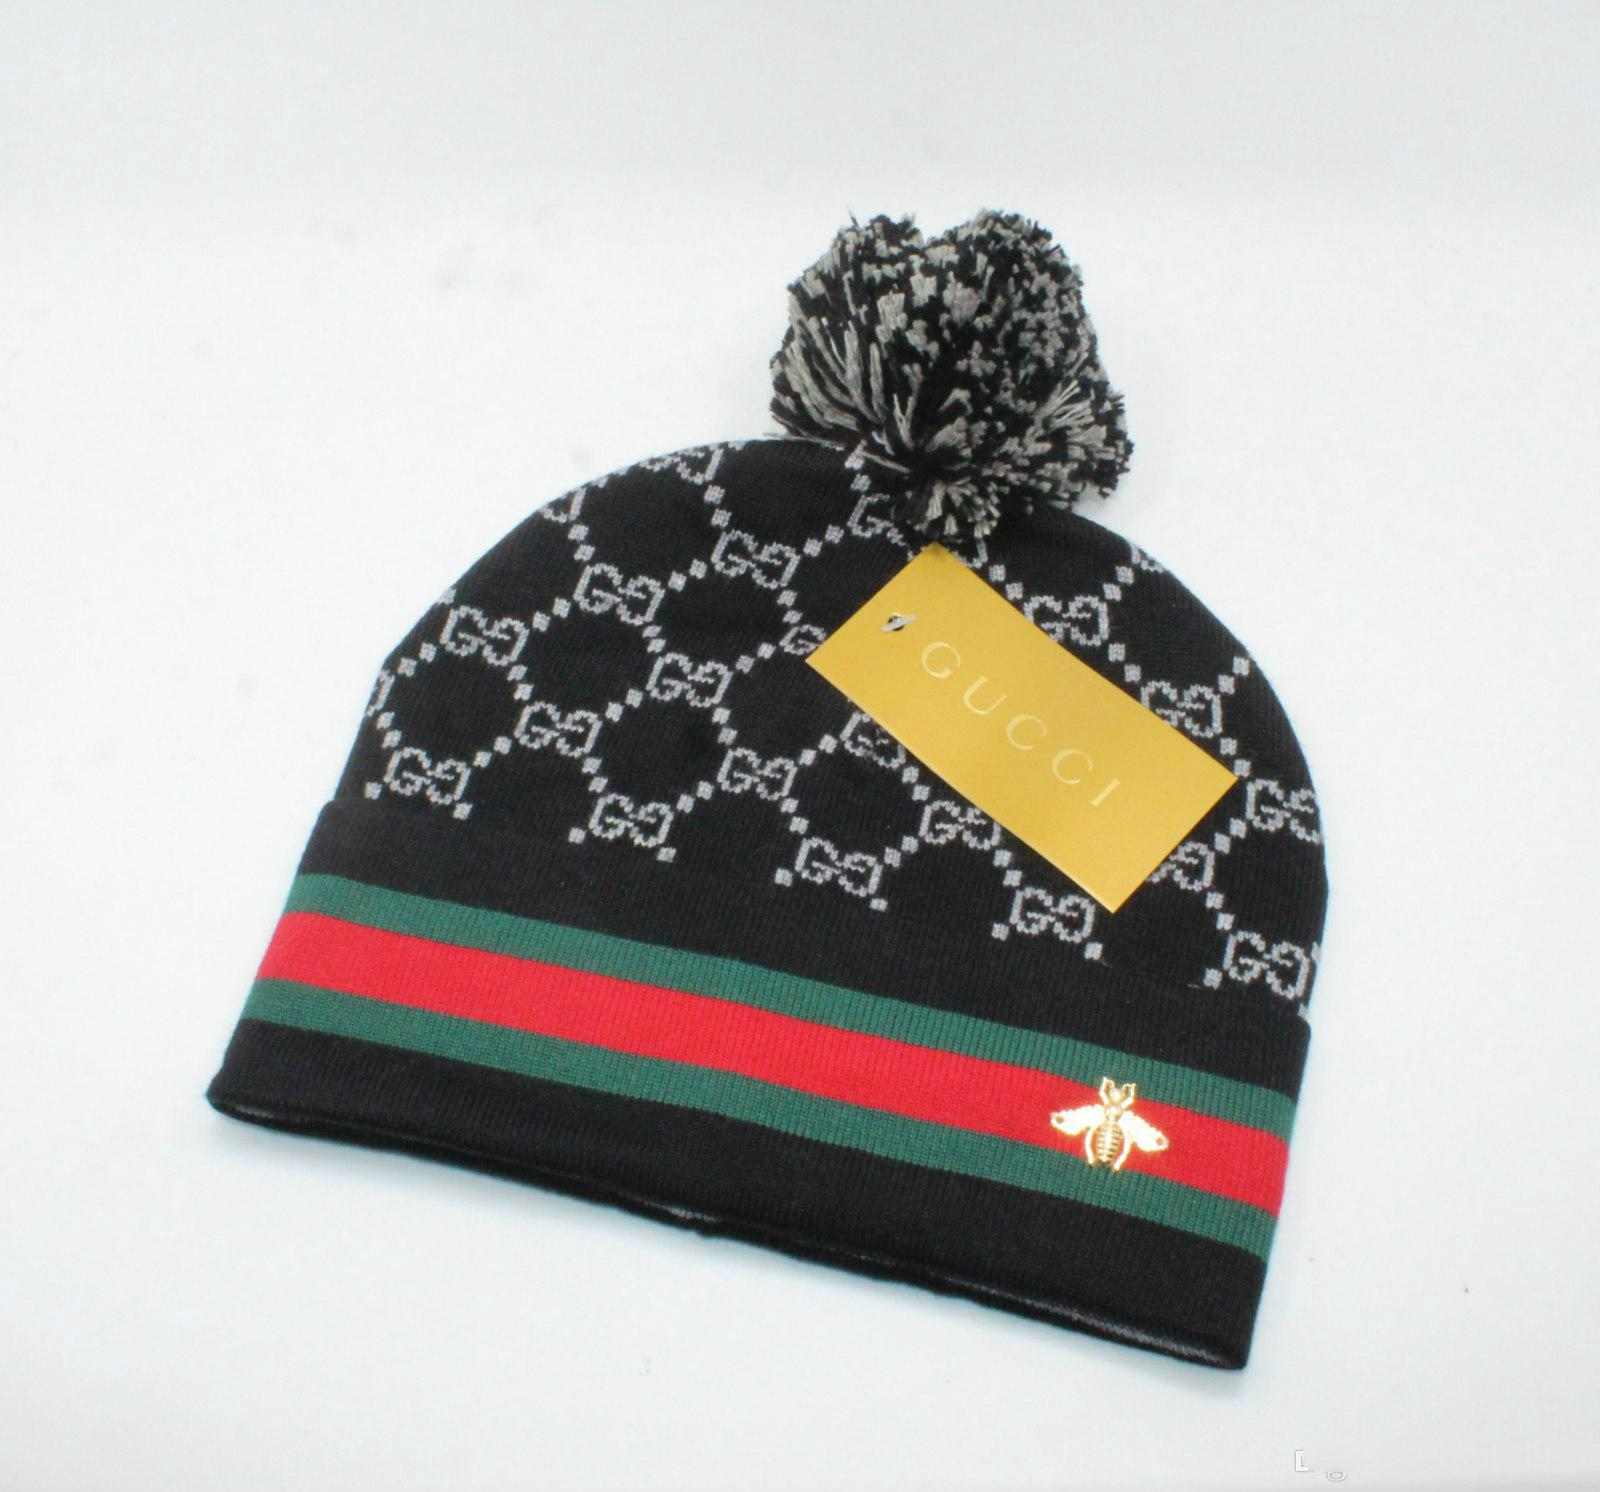 4c258b86e Fashion Unisex Spring Winter Hats for Men women Knitted Beanie Wool Hat Man  Knit Bonnet top quality Beanies hip-hop Gorro Thicken Warm Cap